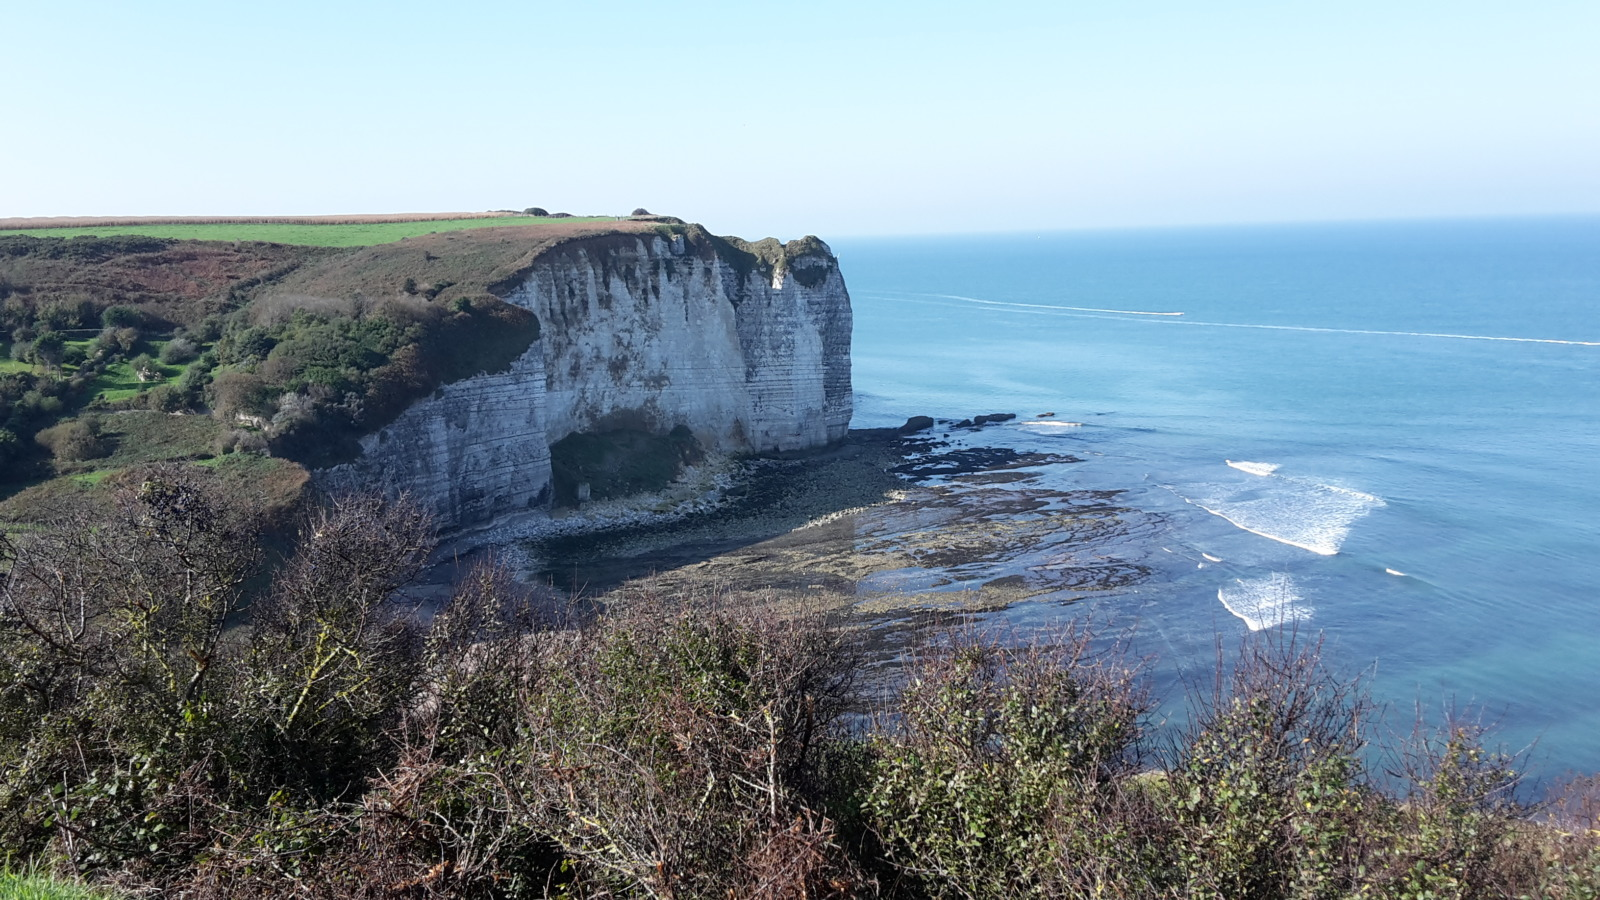 Cliffs near Yport